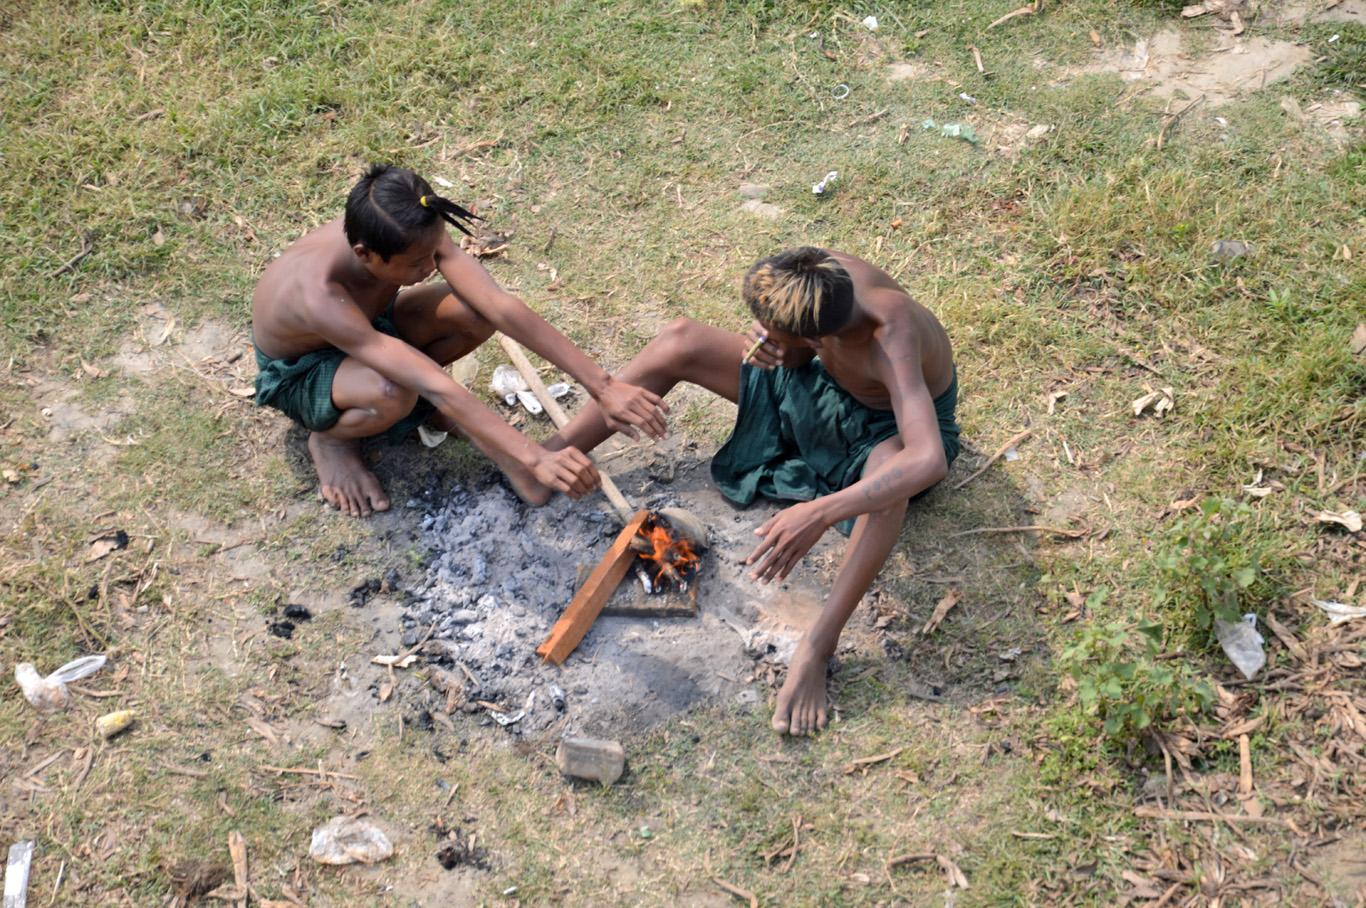 Local boys having a smoke